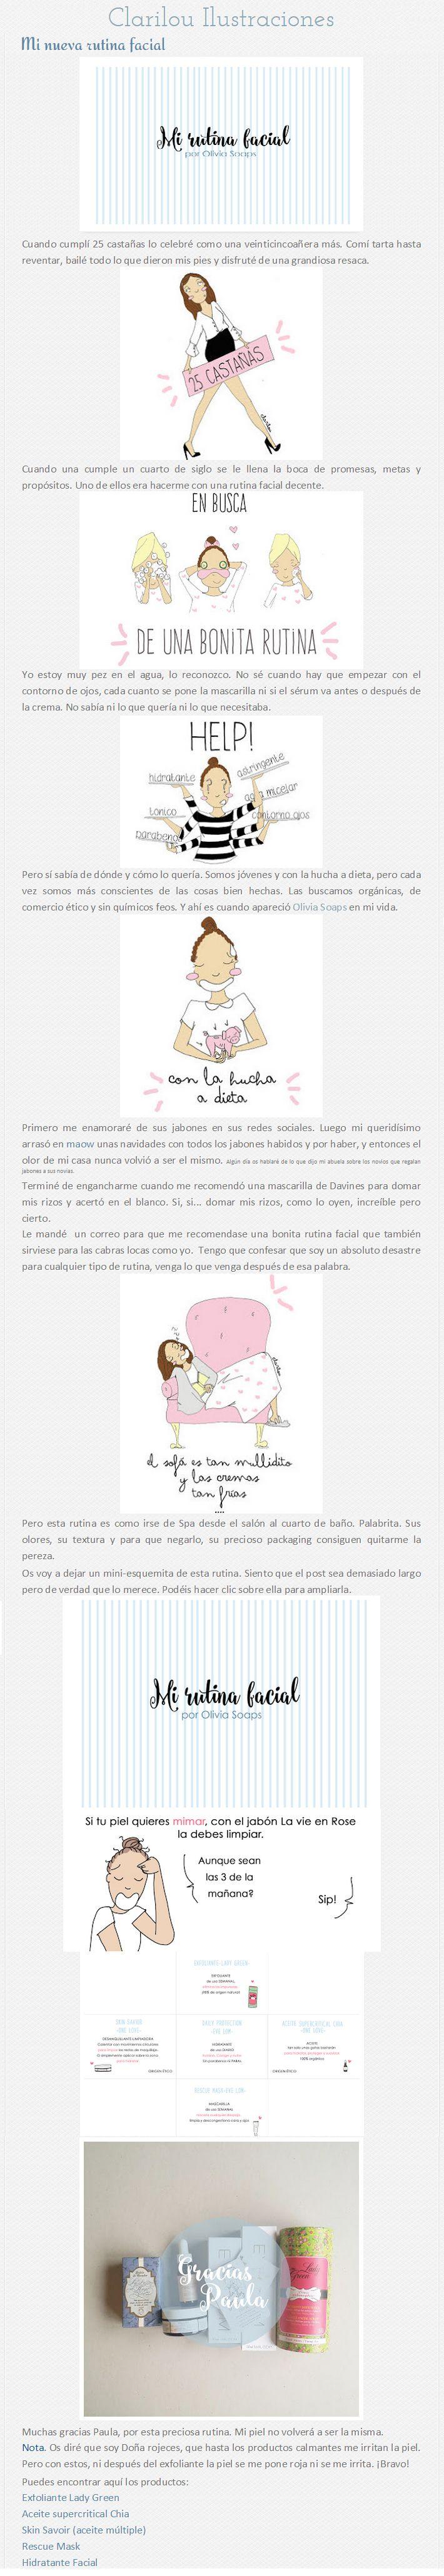 "Blog Ma Petite Clarilou, 3 de agosto de 2015: ""Mi nueva rutina facial"" http://mapetiteclarilou.blogspot.com.es/2015/08/mi-nueva-rutina-facial.html"